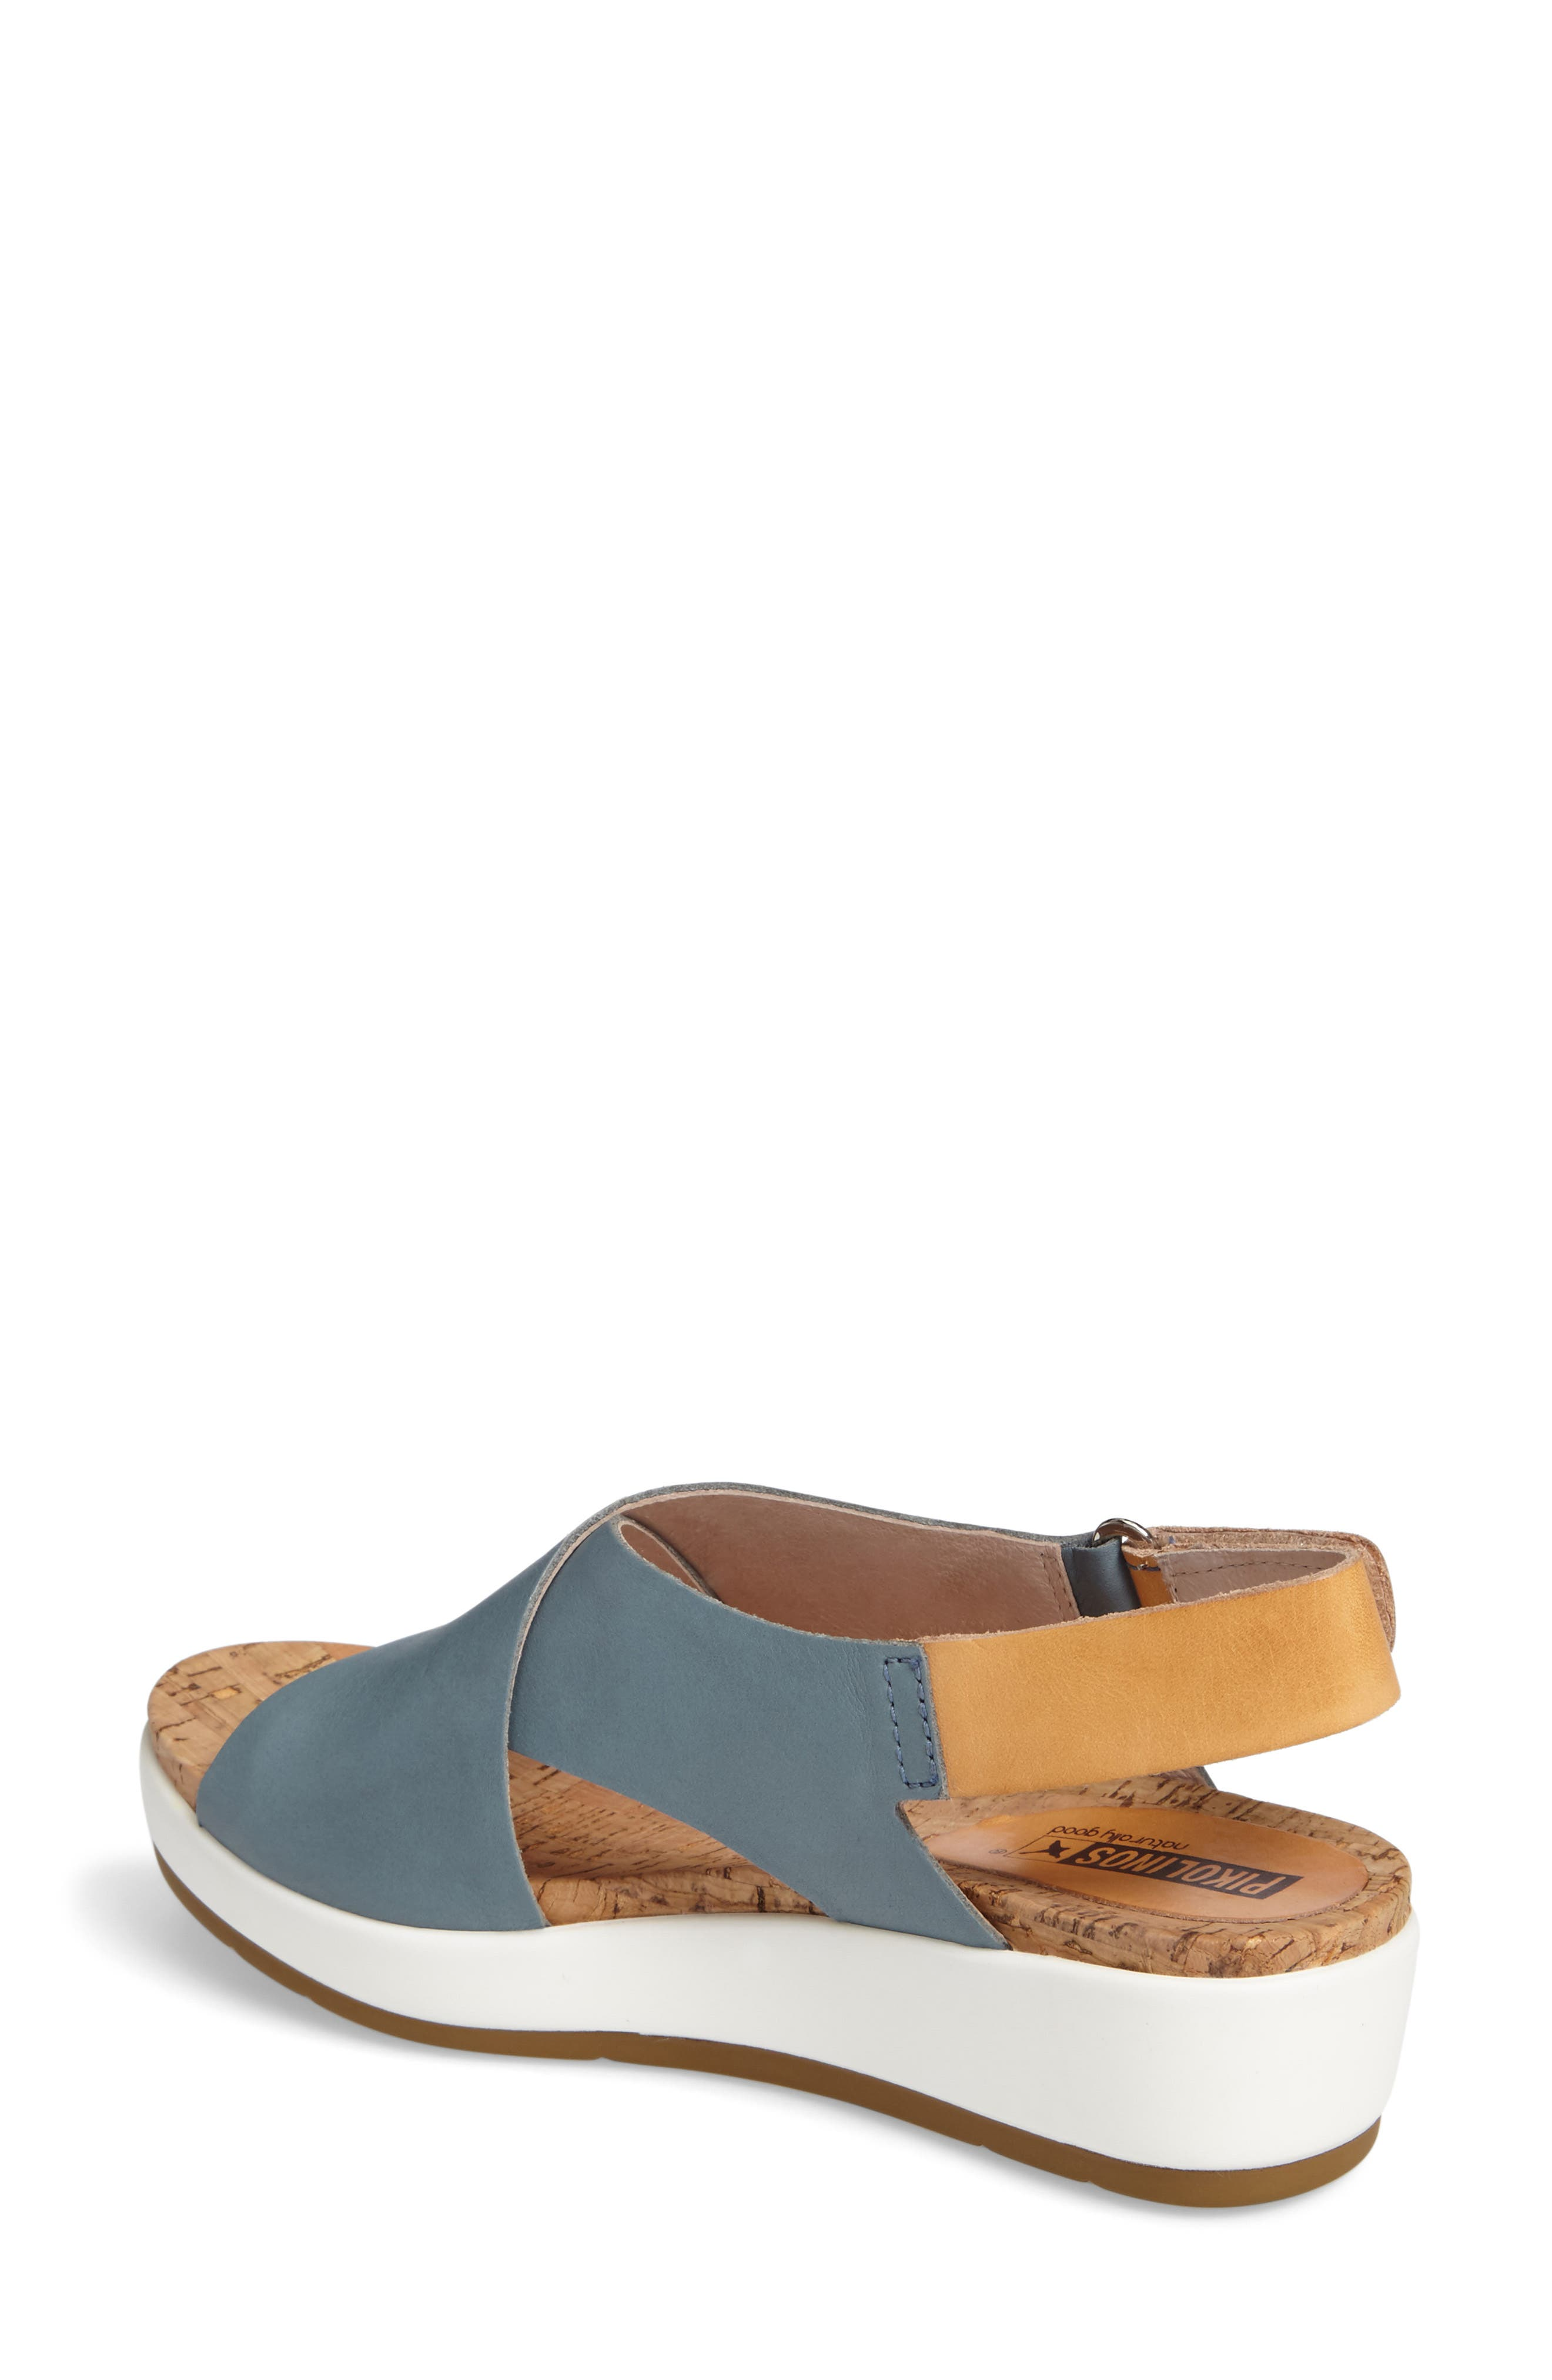 Alternate Image 2  - PIKOLINOS 'Mykonos' Platform Sandal (Women)